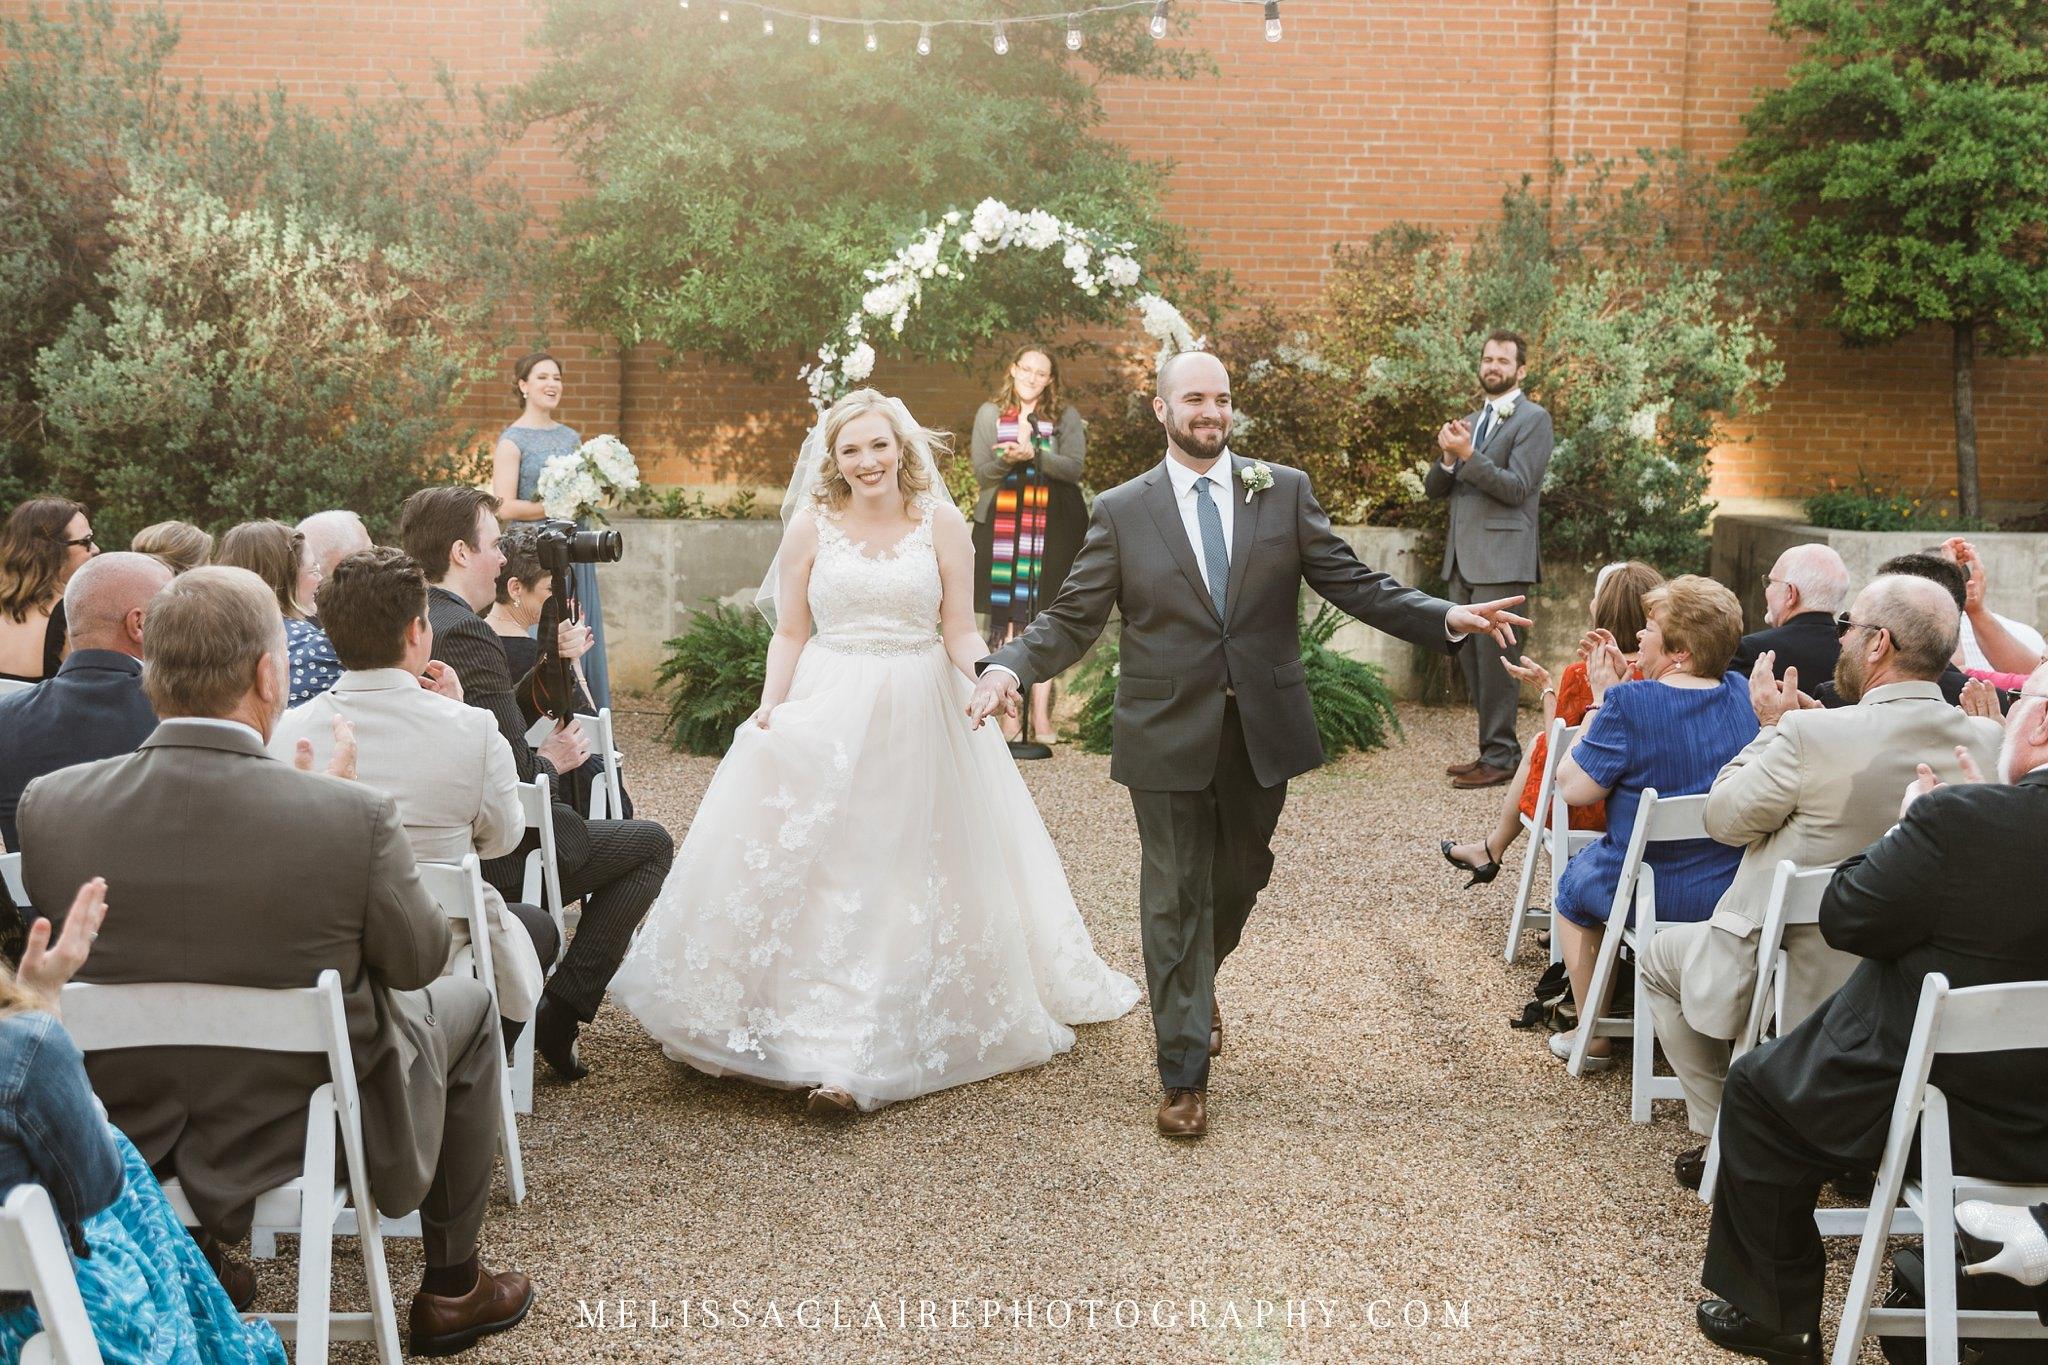 809_at_vickery_wedding_0025